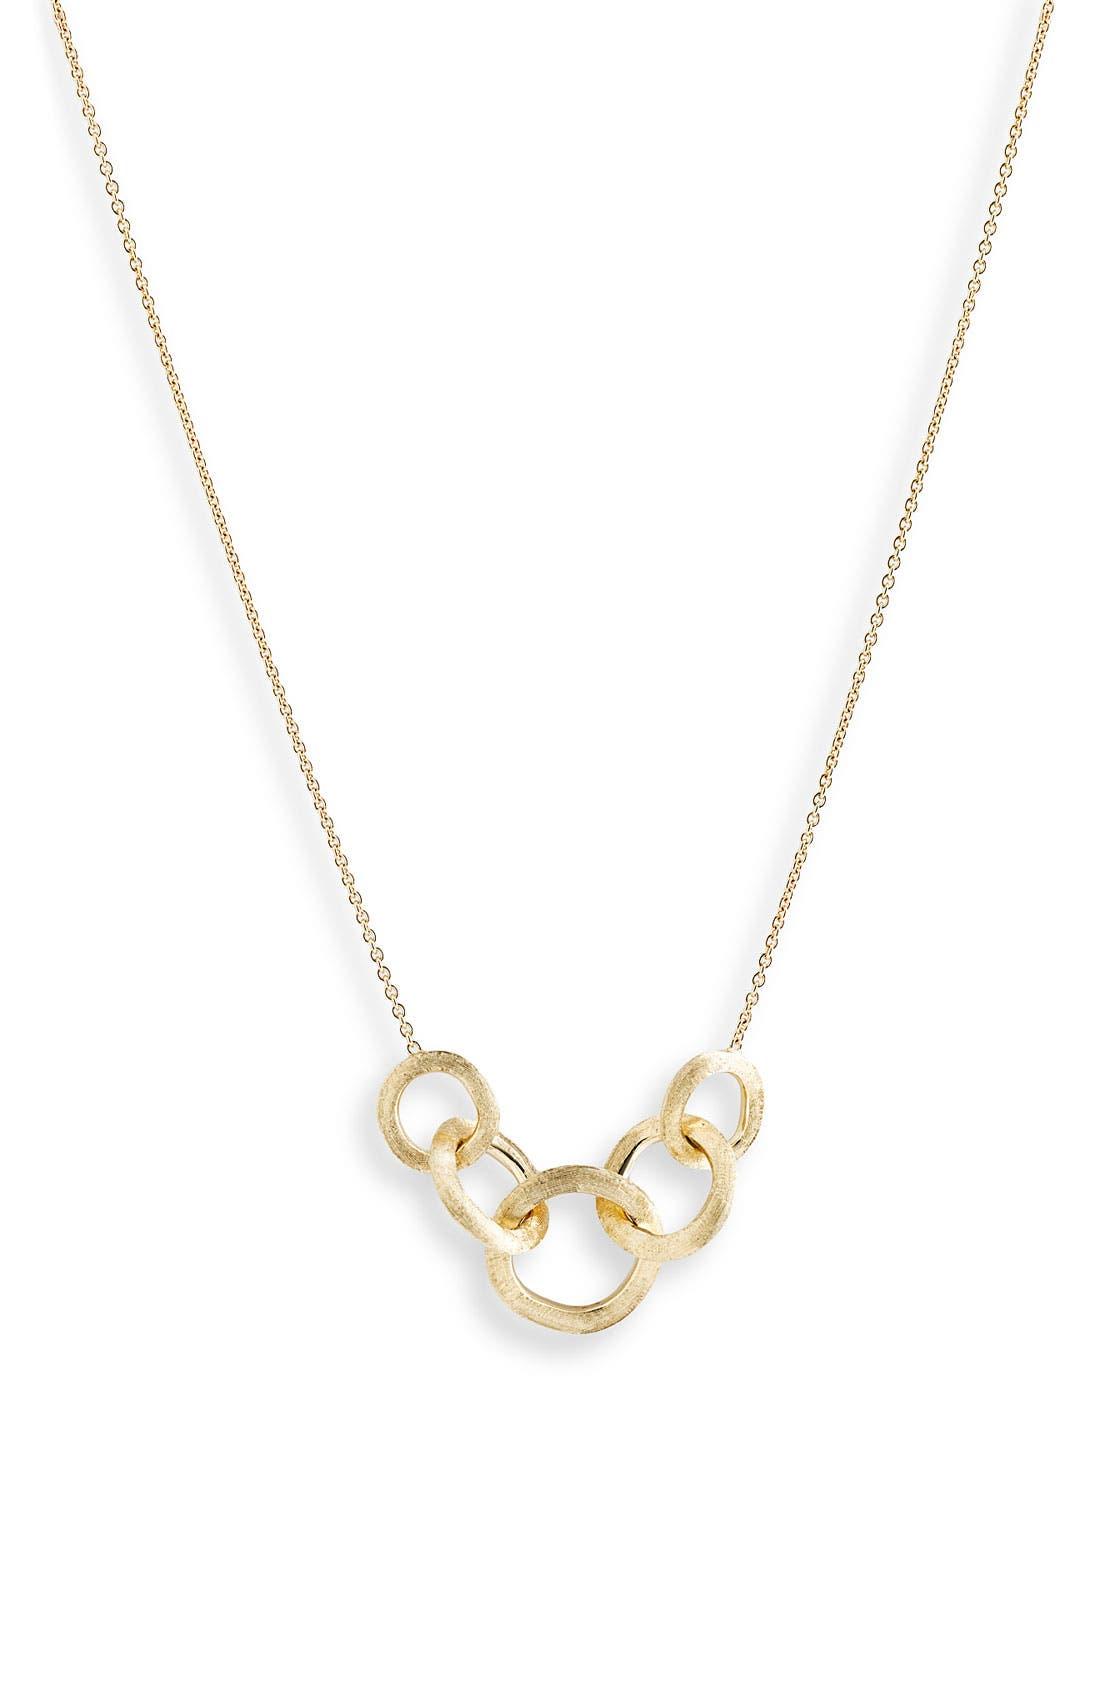 MARCO BICEGO Jaipur Link Necklace